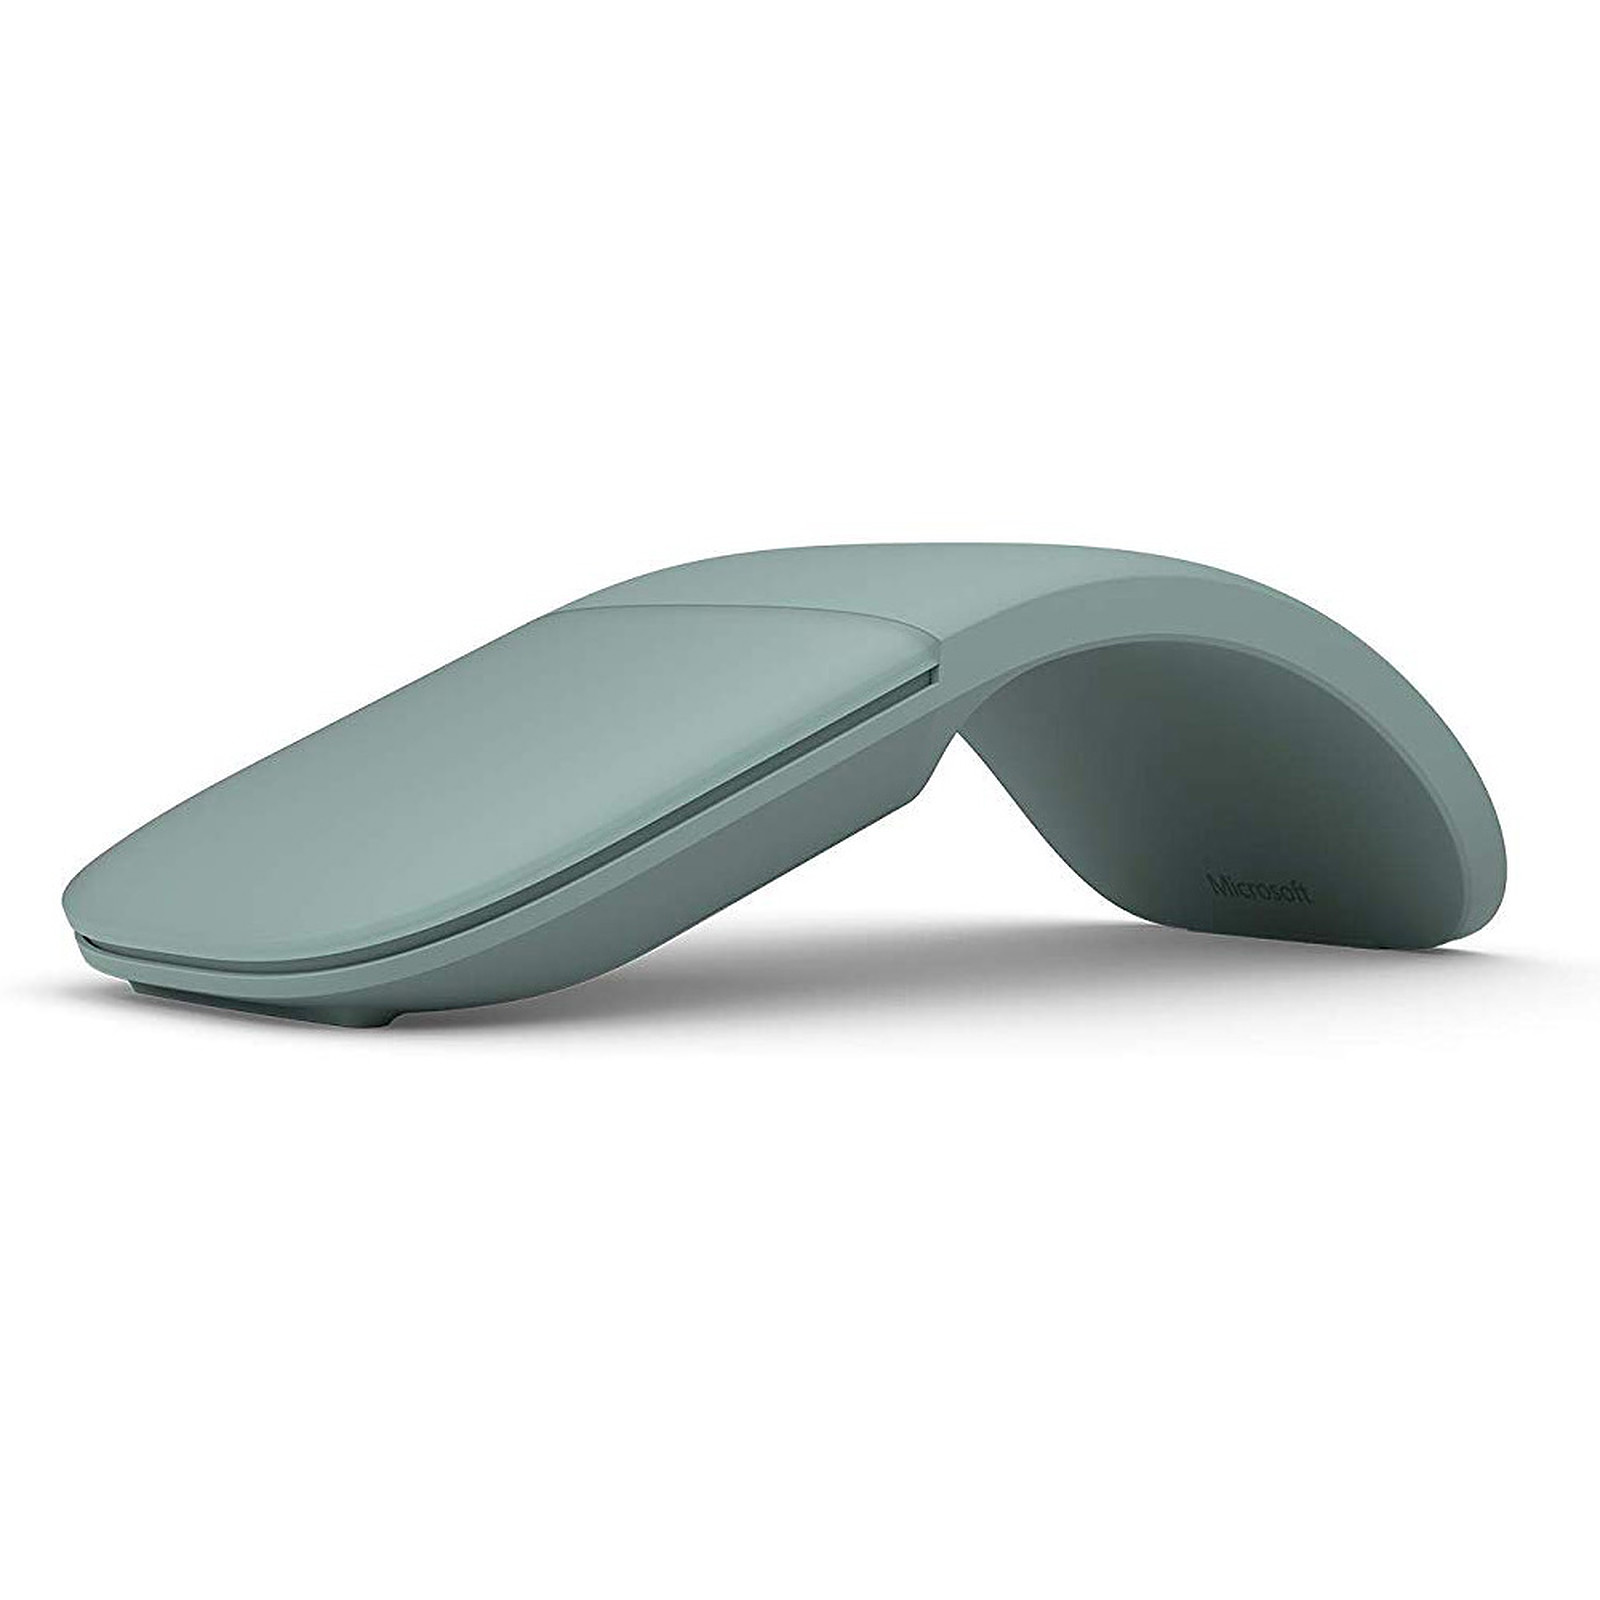 Code Couleur Vert Sauge microsoft arc mouse vert sauge